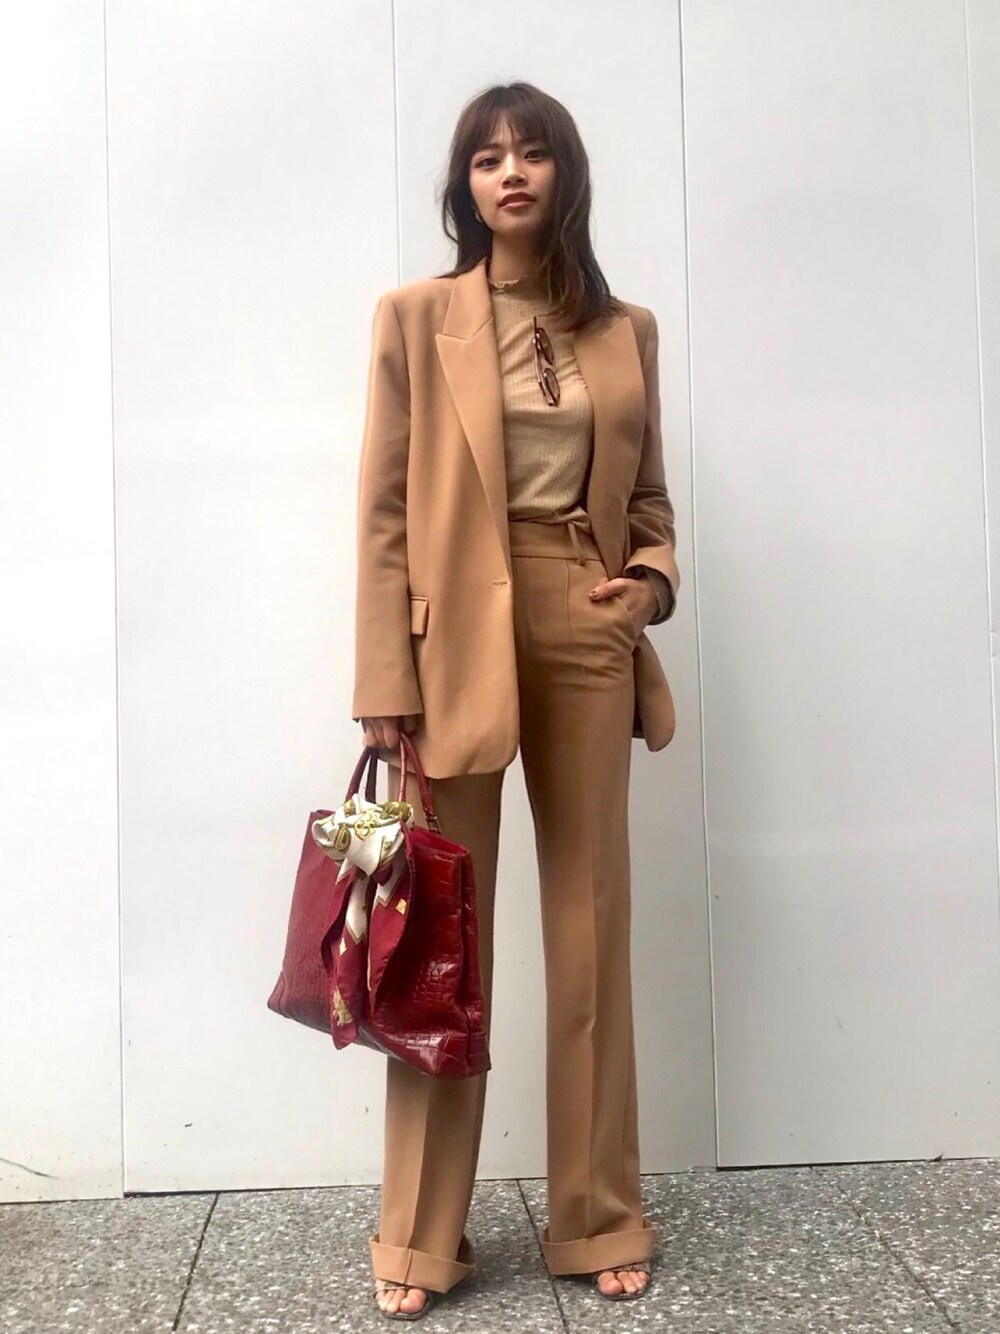 Zara スーツ レディース ザラ スーツ(レディース)の通販 300点以上